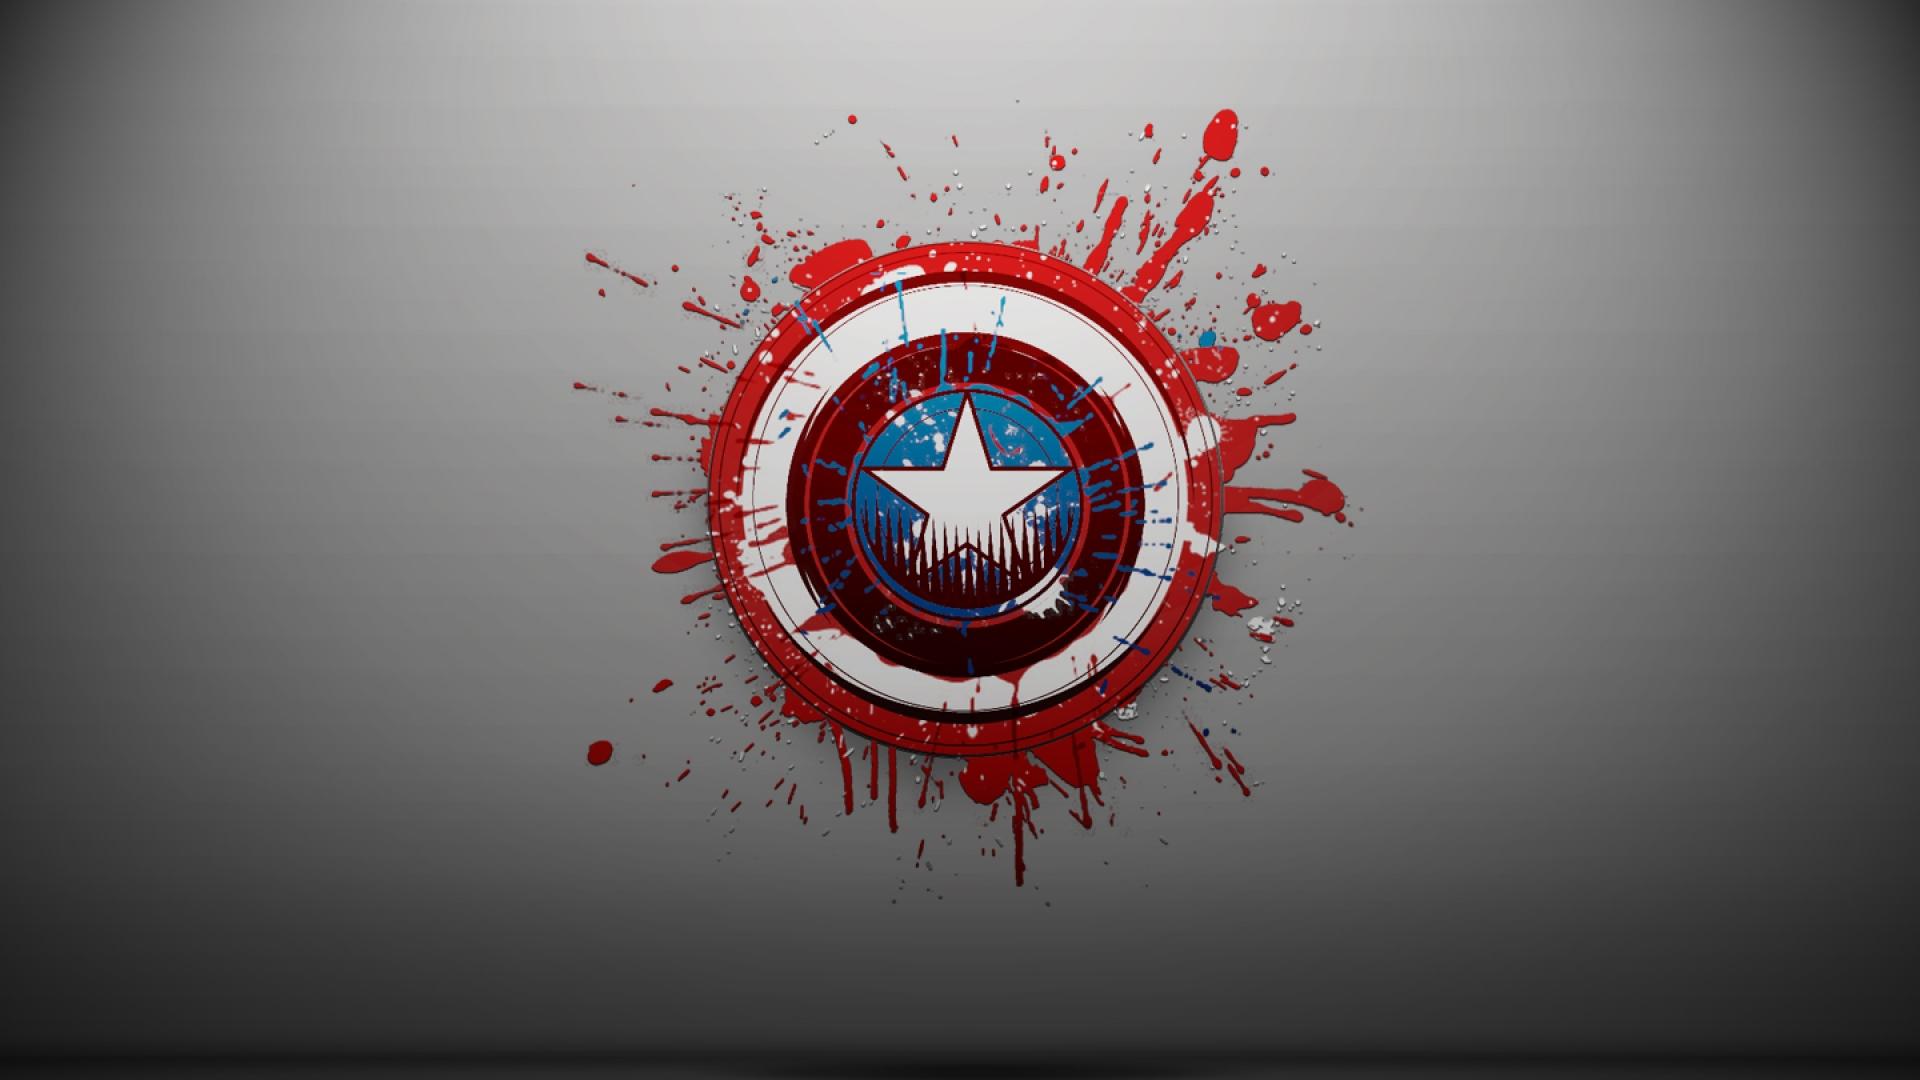 Hd wallpaper of captain america - Download Captain America Logo Wallpaper Hd Wallpaper